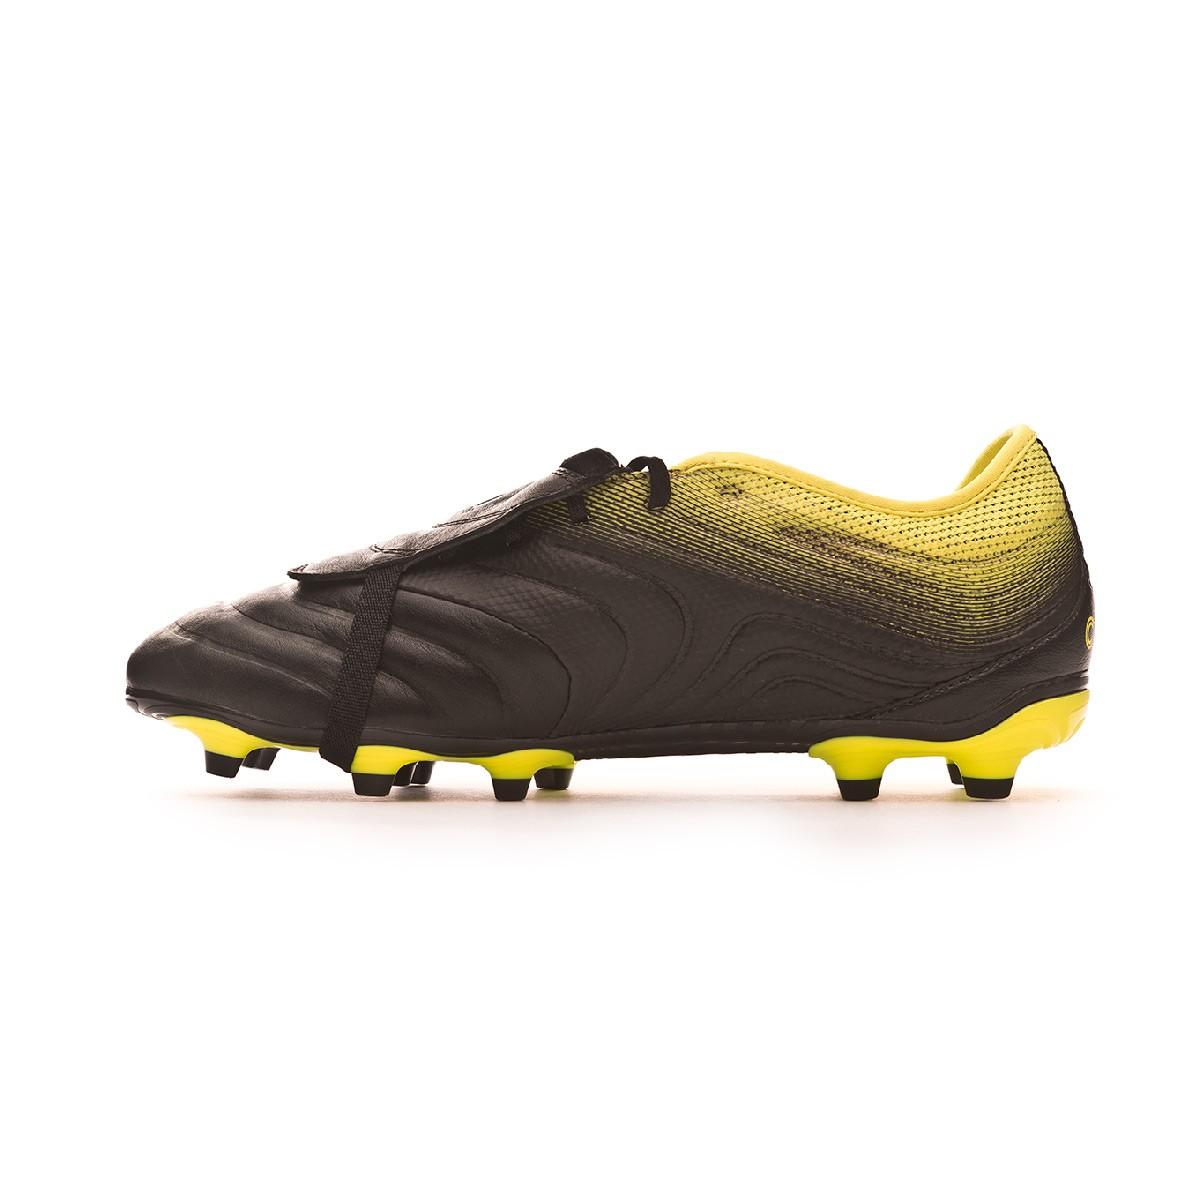 adidas Scarpe Calcio Adidas Copa Gloro 19.2 Fg Exhibit